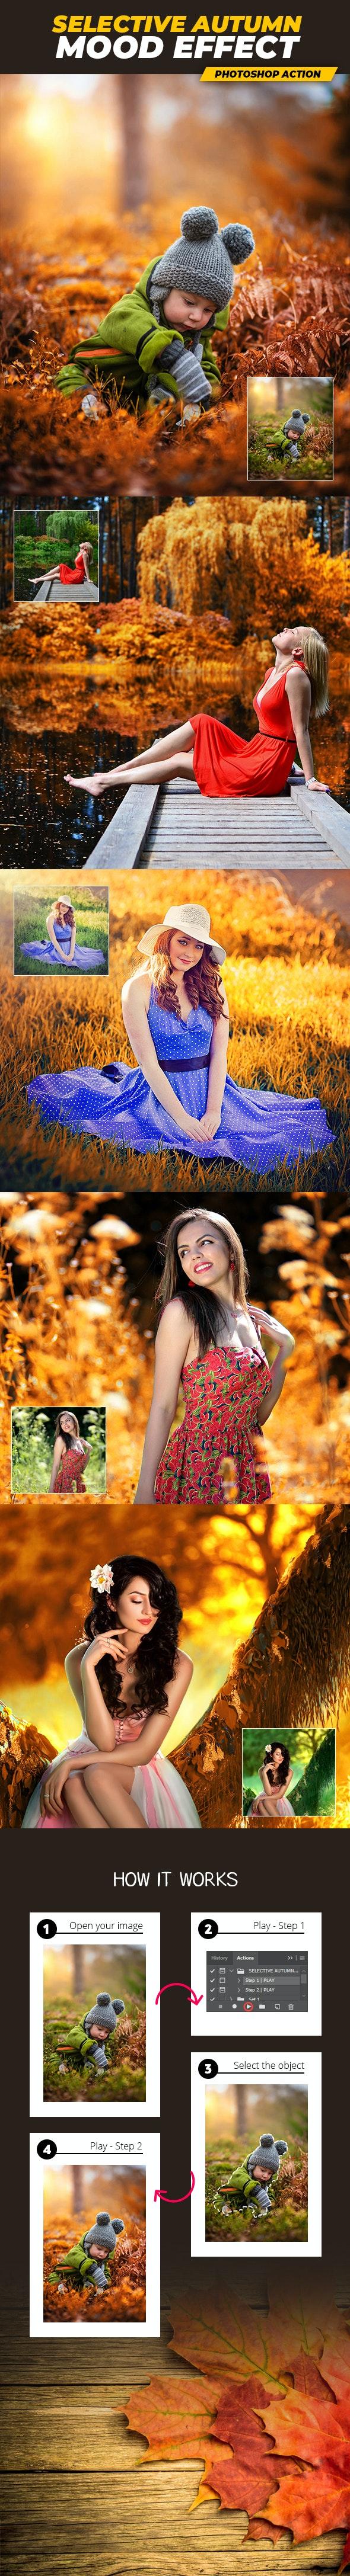 Selective Autumn Mood Effect - Photoshop Action